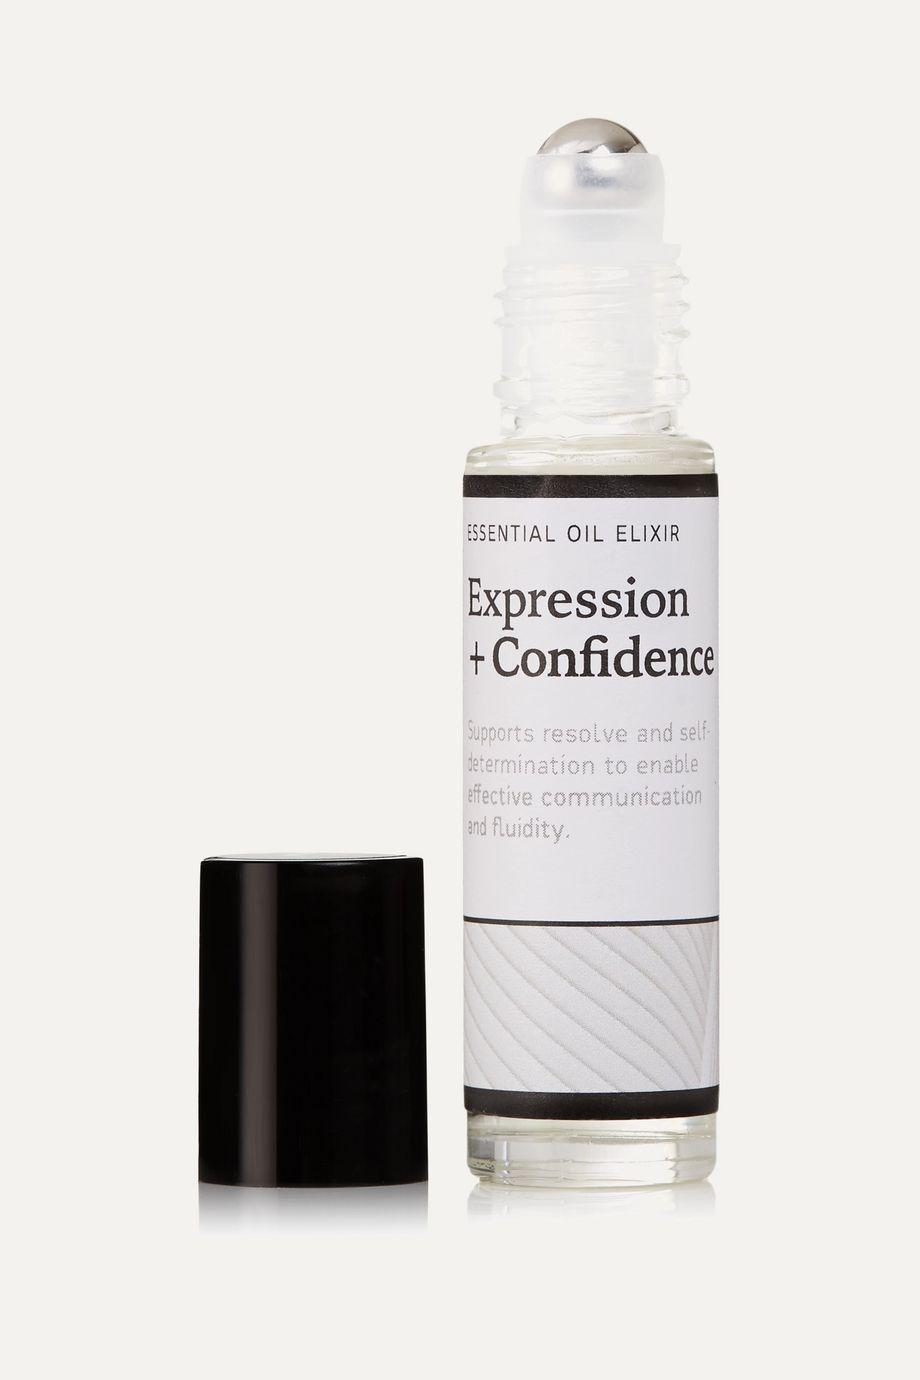 anatomē Essential Oil Elixir - Expression + Confidence, 10ml